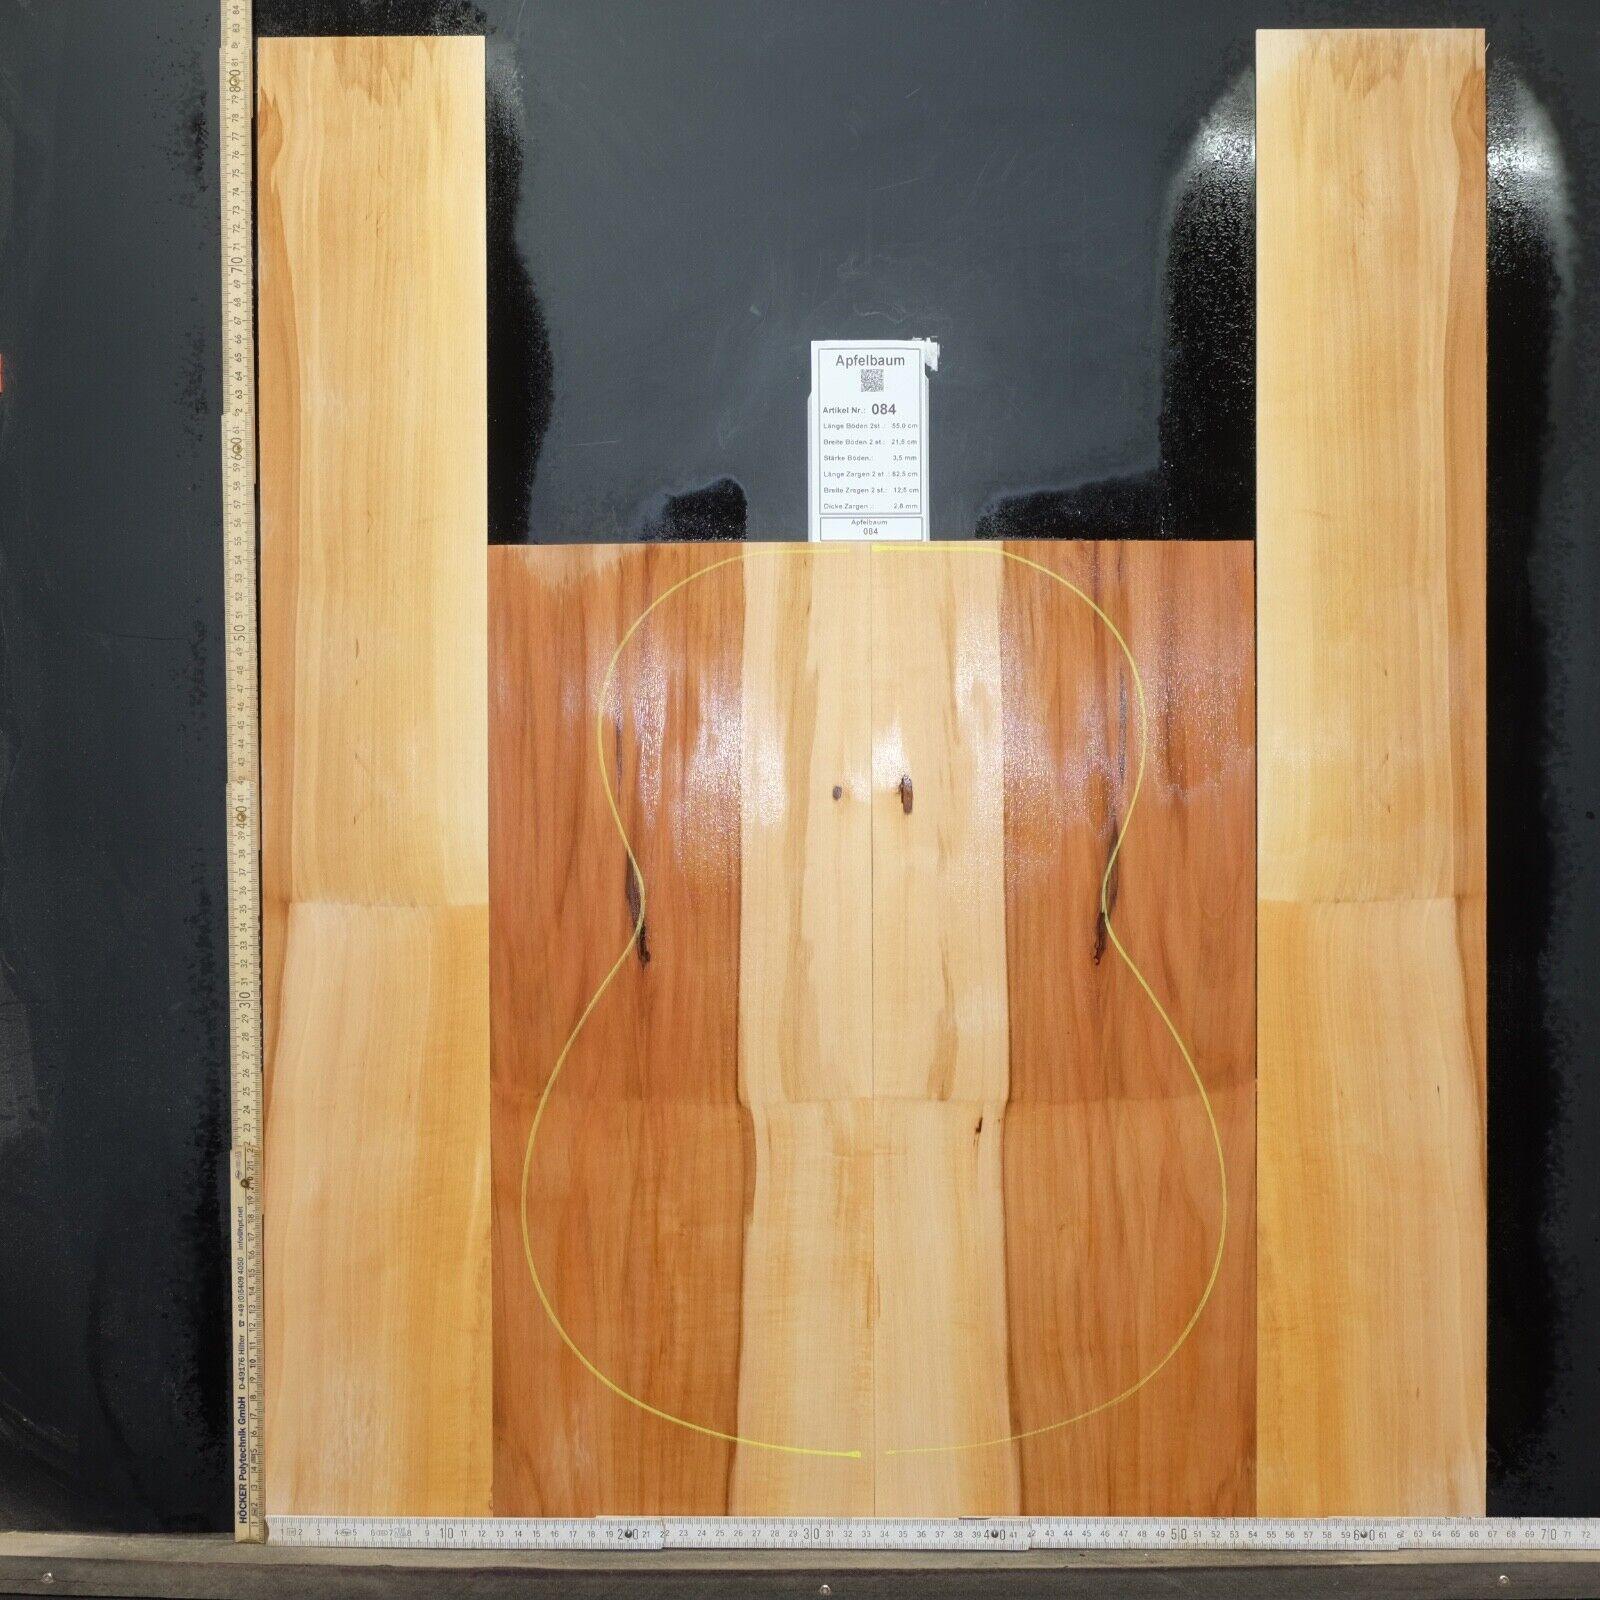 Tonewood Apfelbaum Apfel Tonholz Guitar Builder Acoustic Backs and sides SET 084